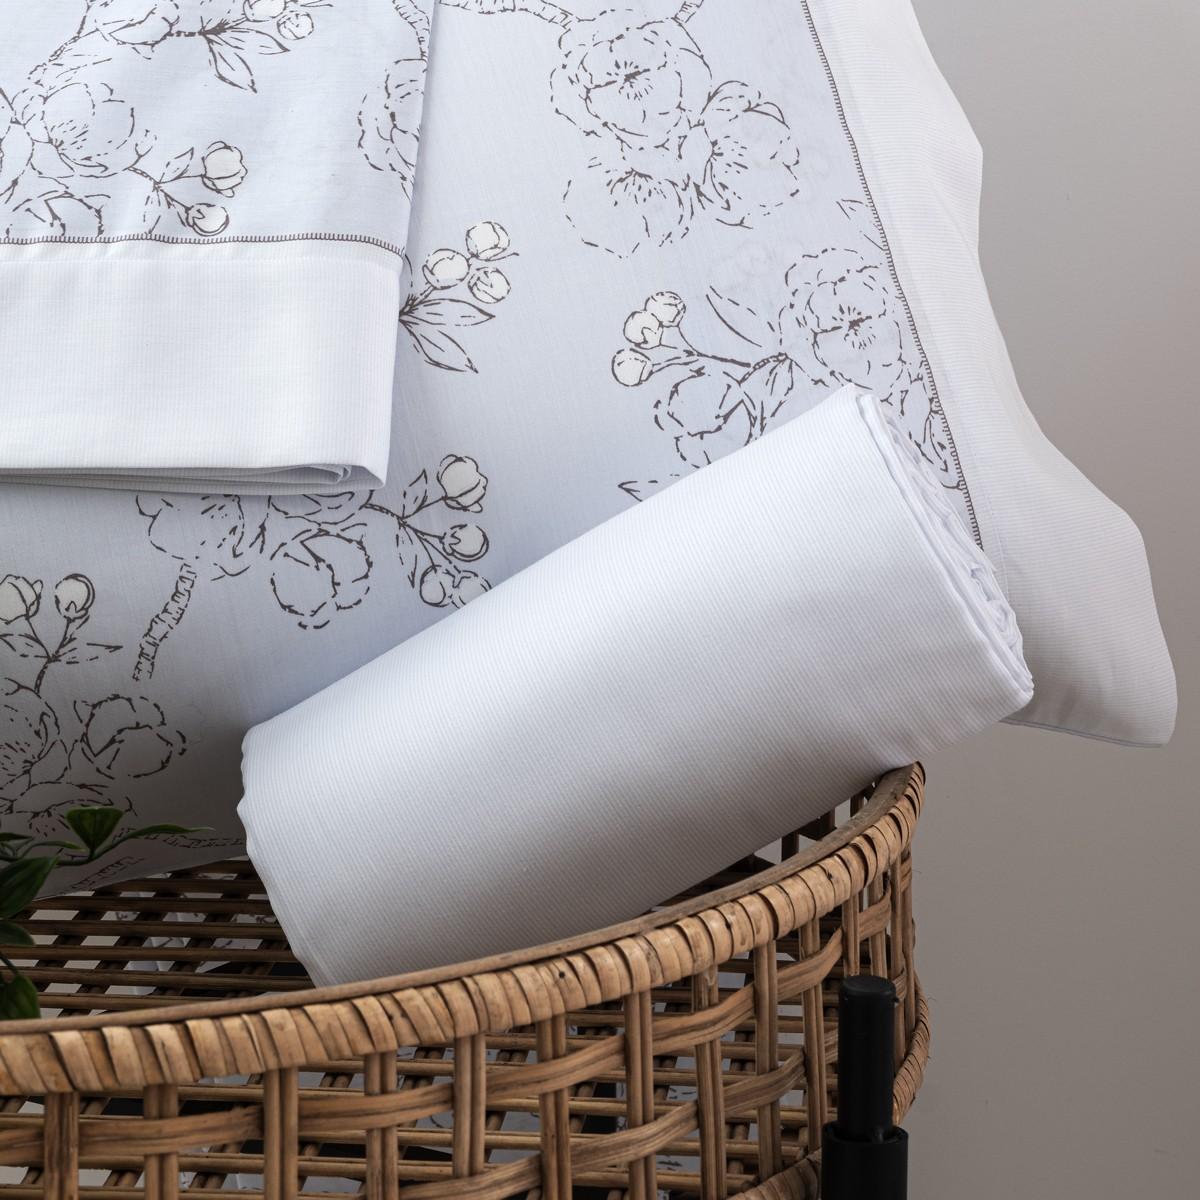 Sheet Set Amorosa Cotton Satin, LAMEIRINHO